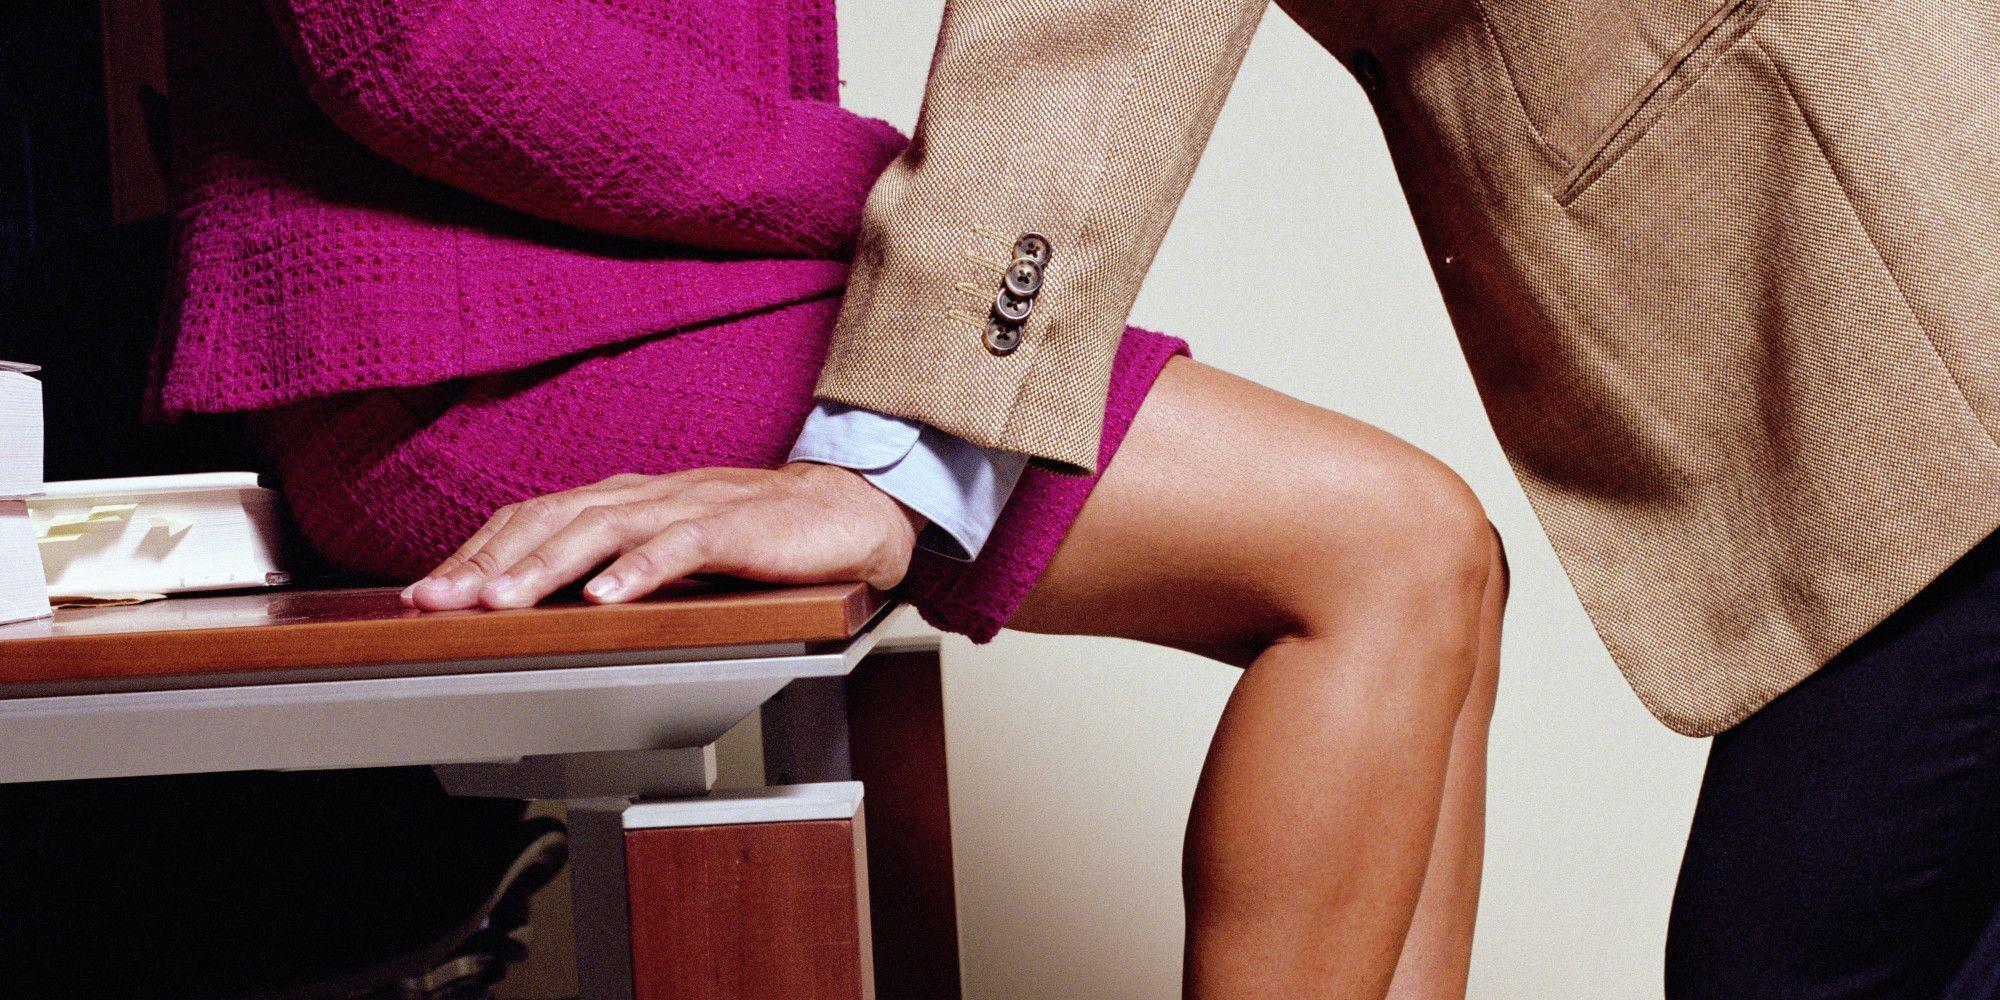 Proposta indecente al colloquio di lavoro: i casi più eclatanti